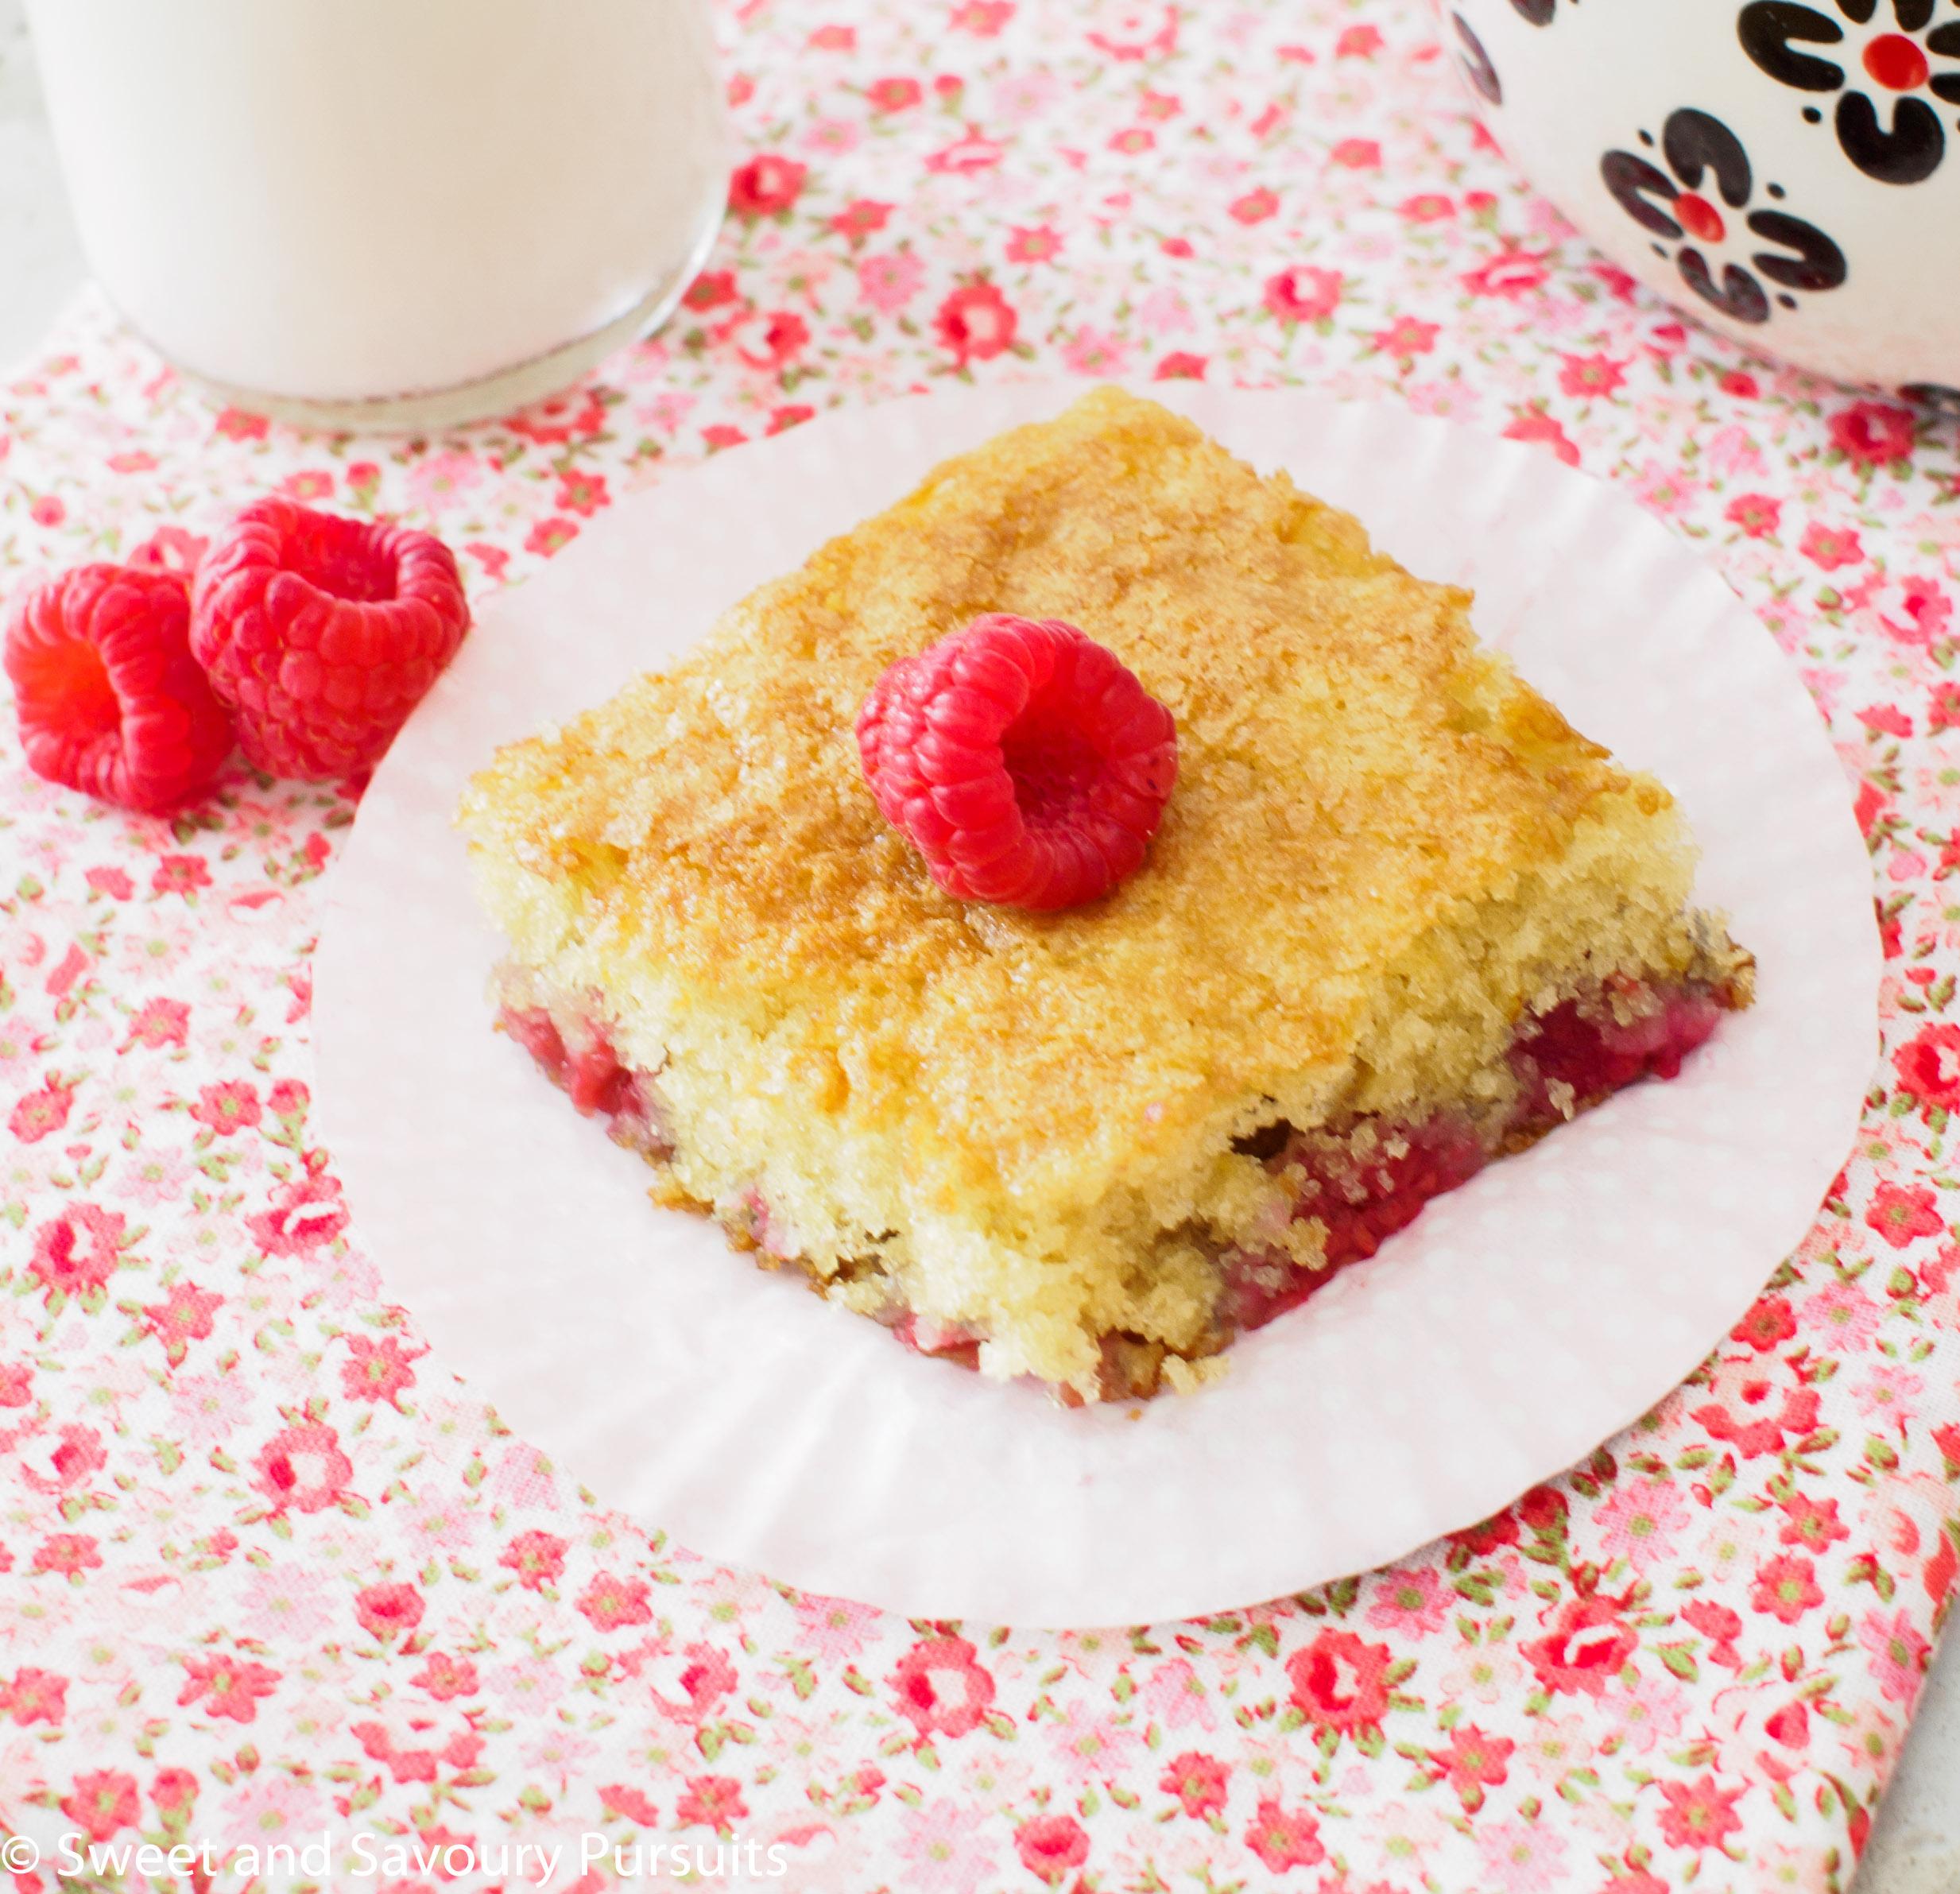 Slice of Raspberry Buttermilk Cake